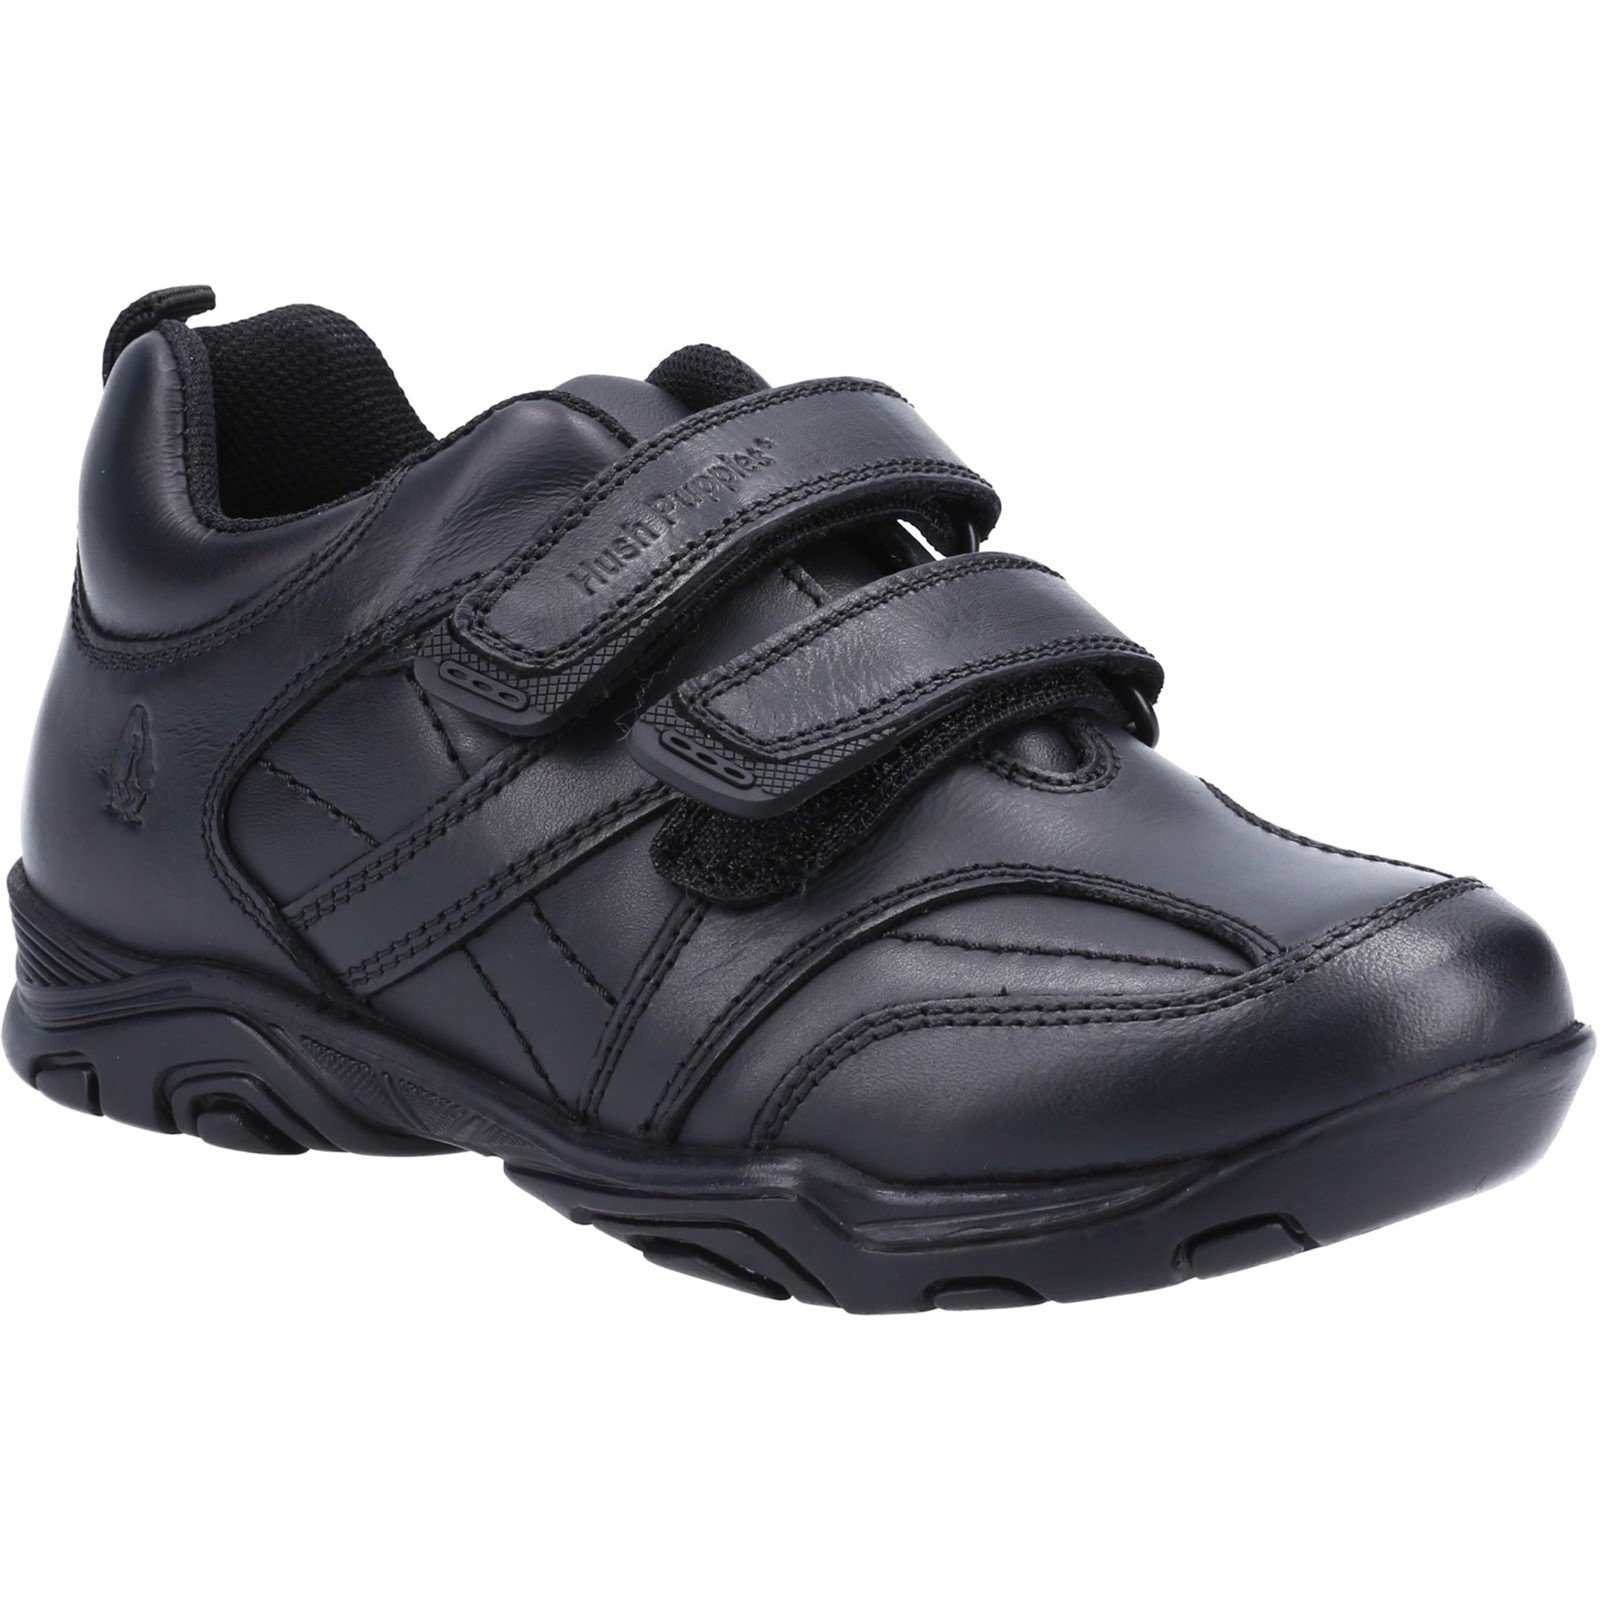 Hush Puppies Kid's Levi Infant School Shoe Black 32629 - Black 11